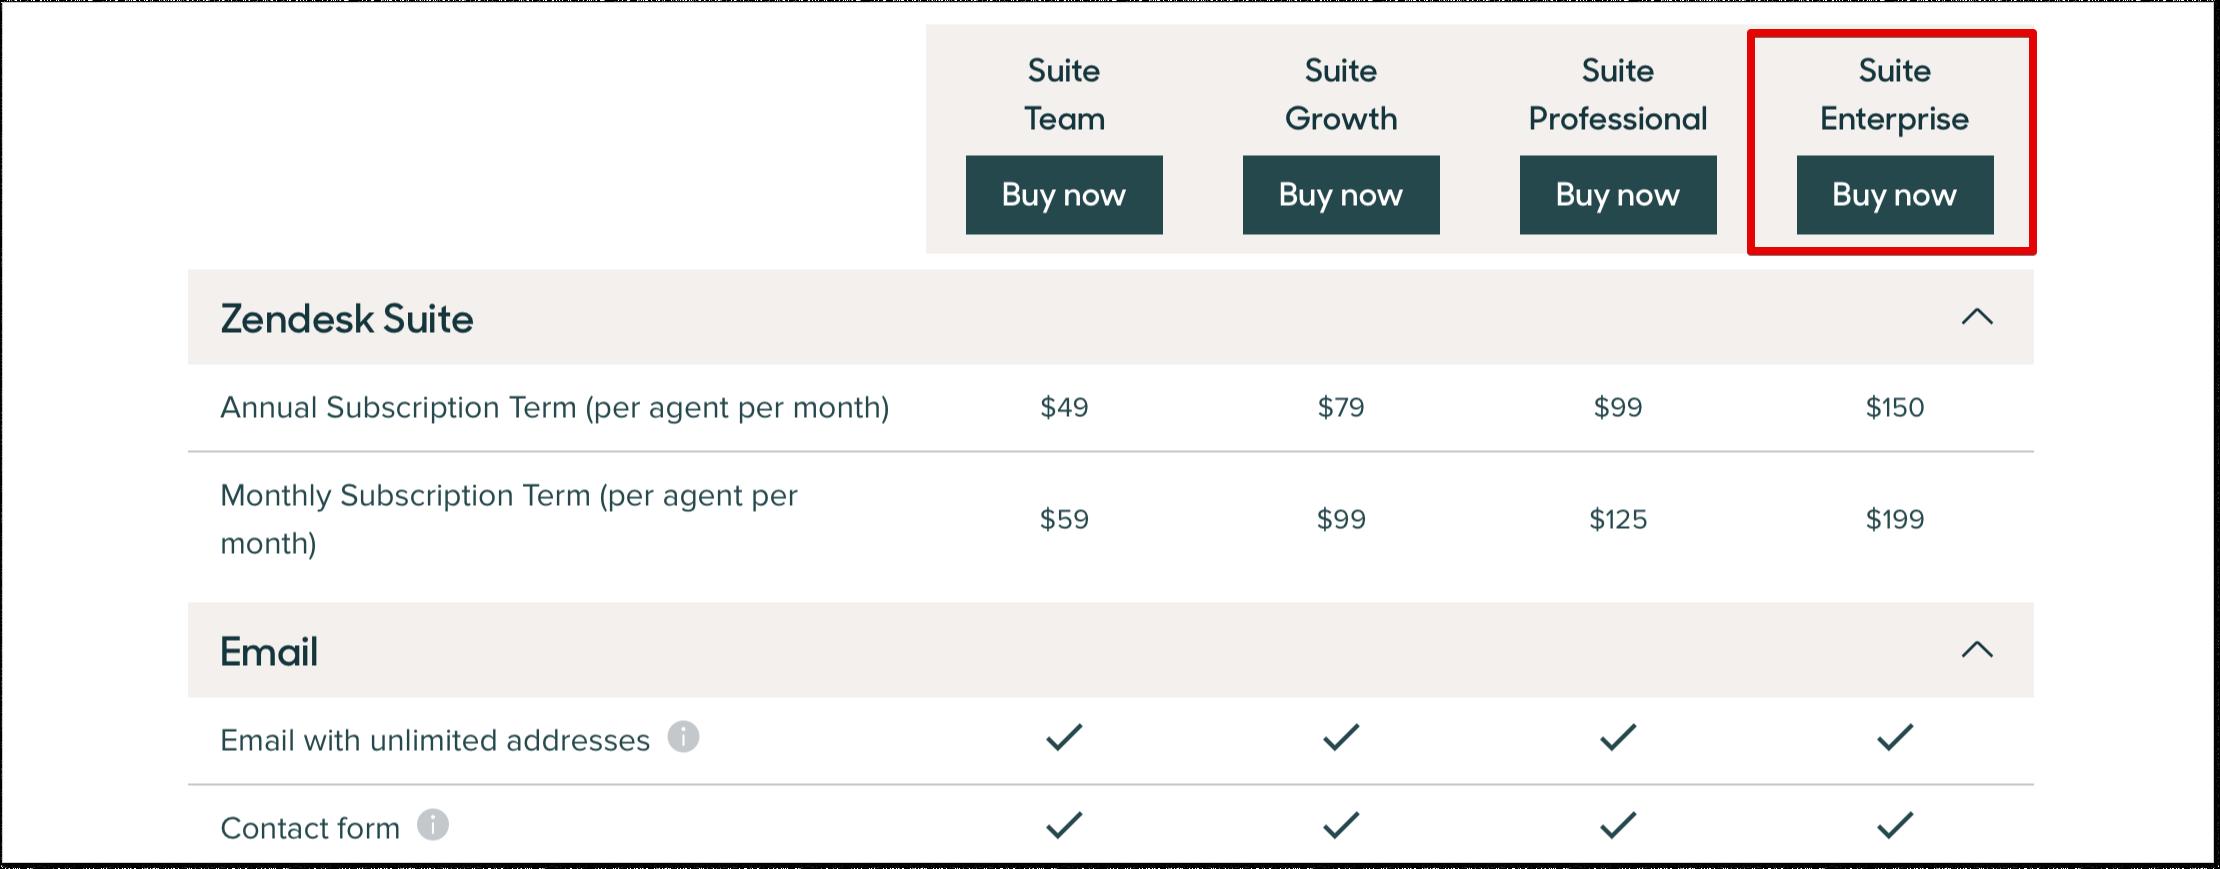 Zendesk Suite Enterprise pricing